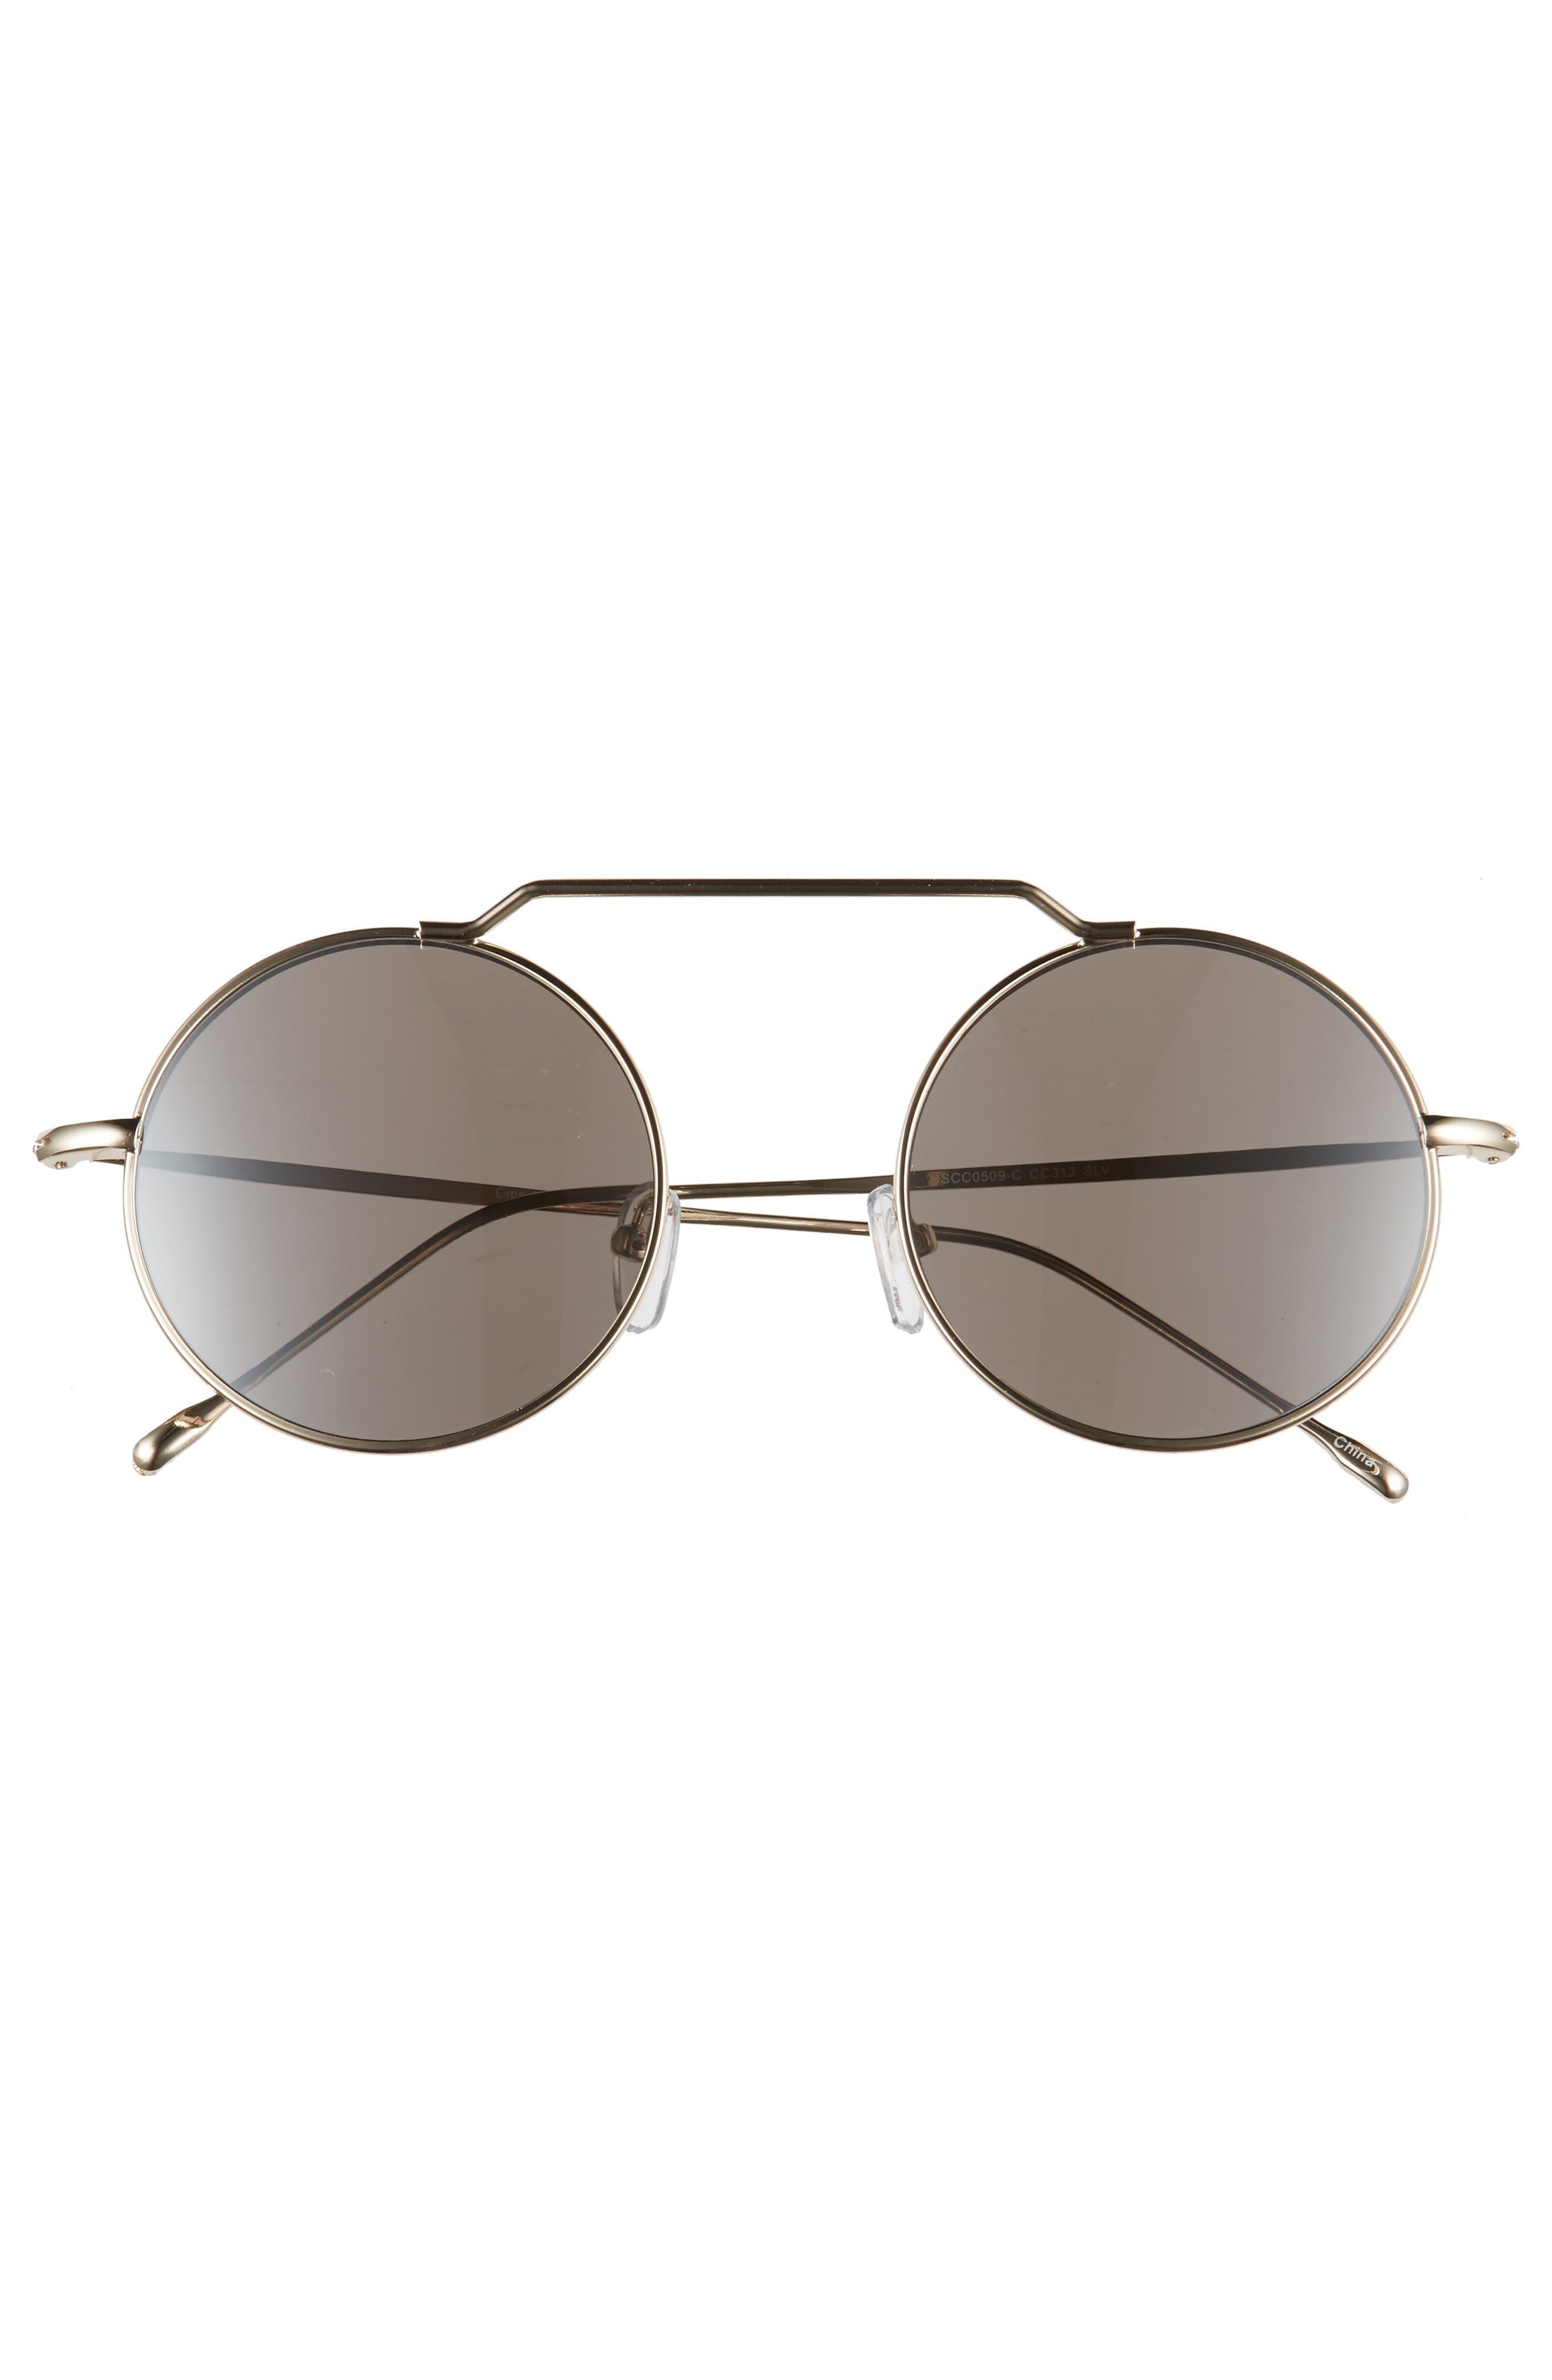 51mm Brow Bar Round Sunglasses,                             Alternate thumbnail 8, color,